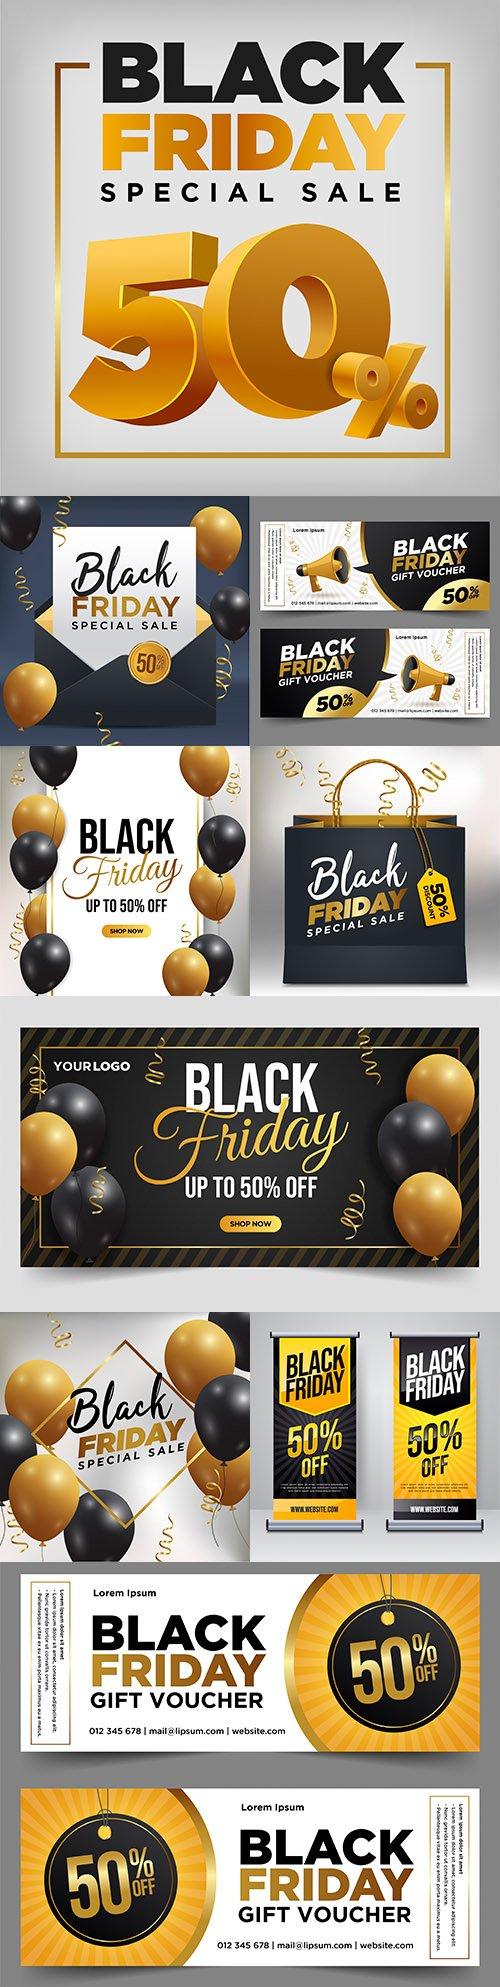 Black Friday and sale special design illustration 38